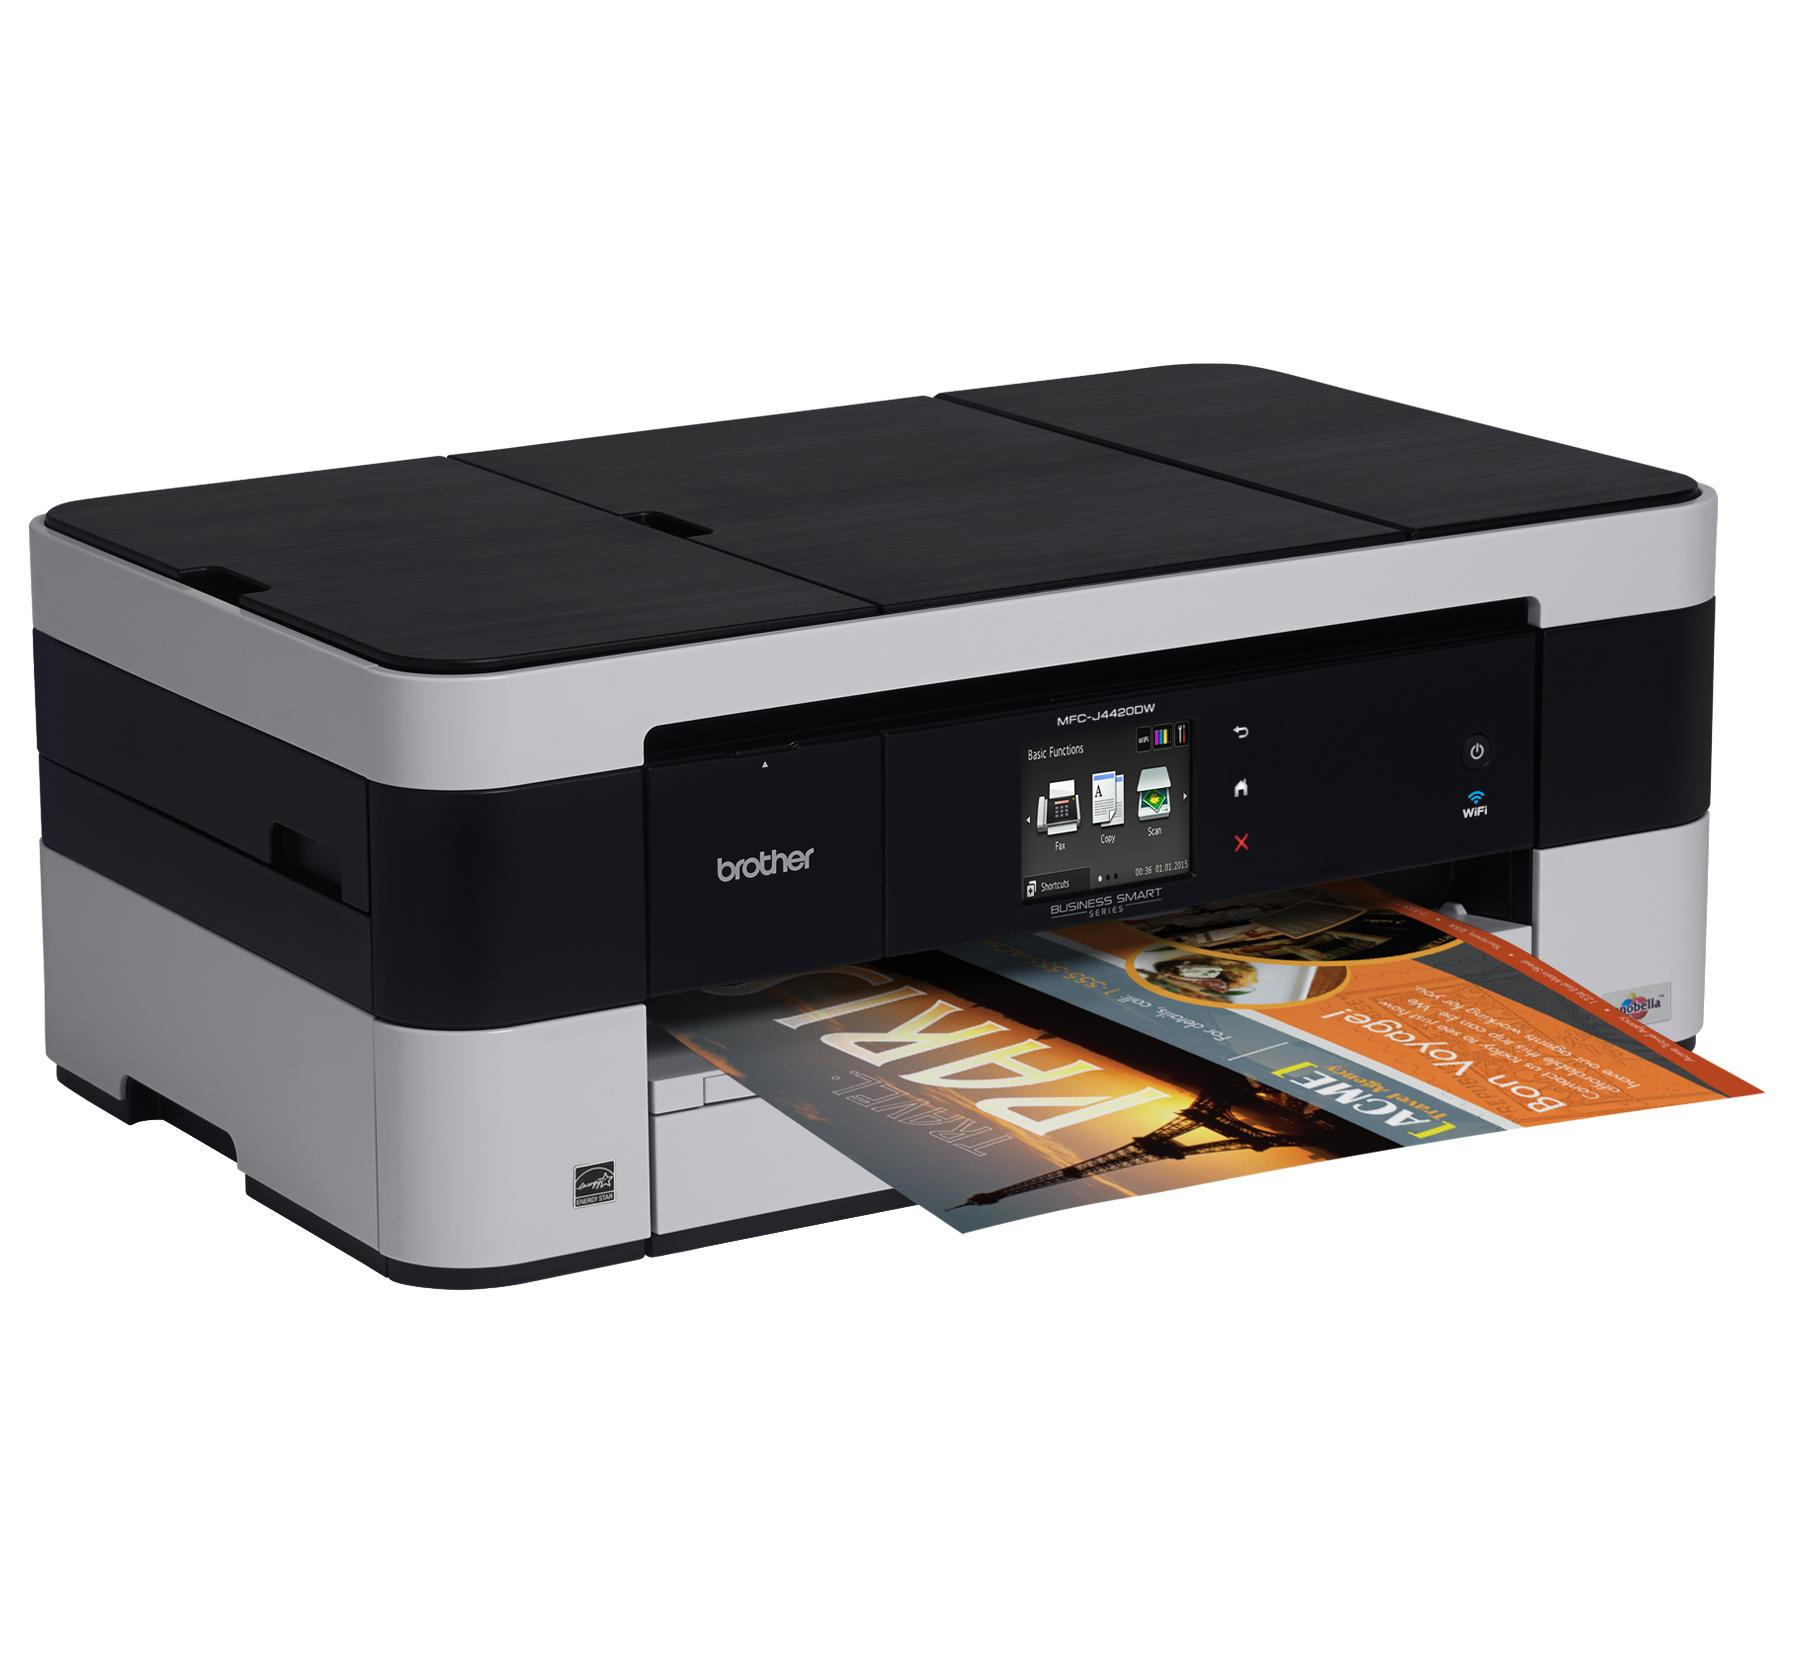 Amazon Brother Printer MFCJ4420DW Wireless Color Inkjet All